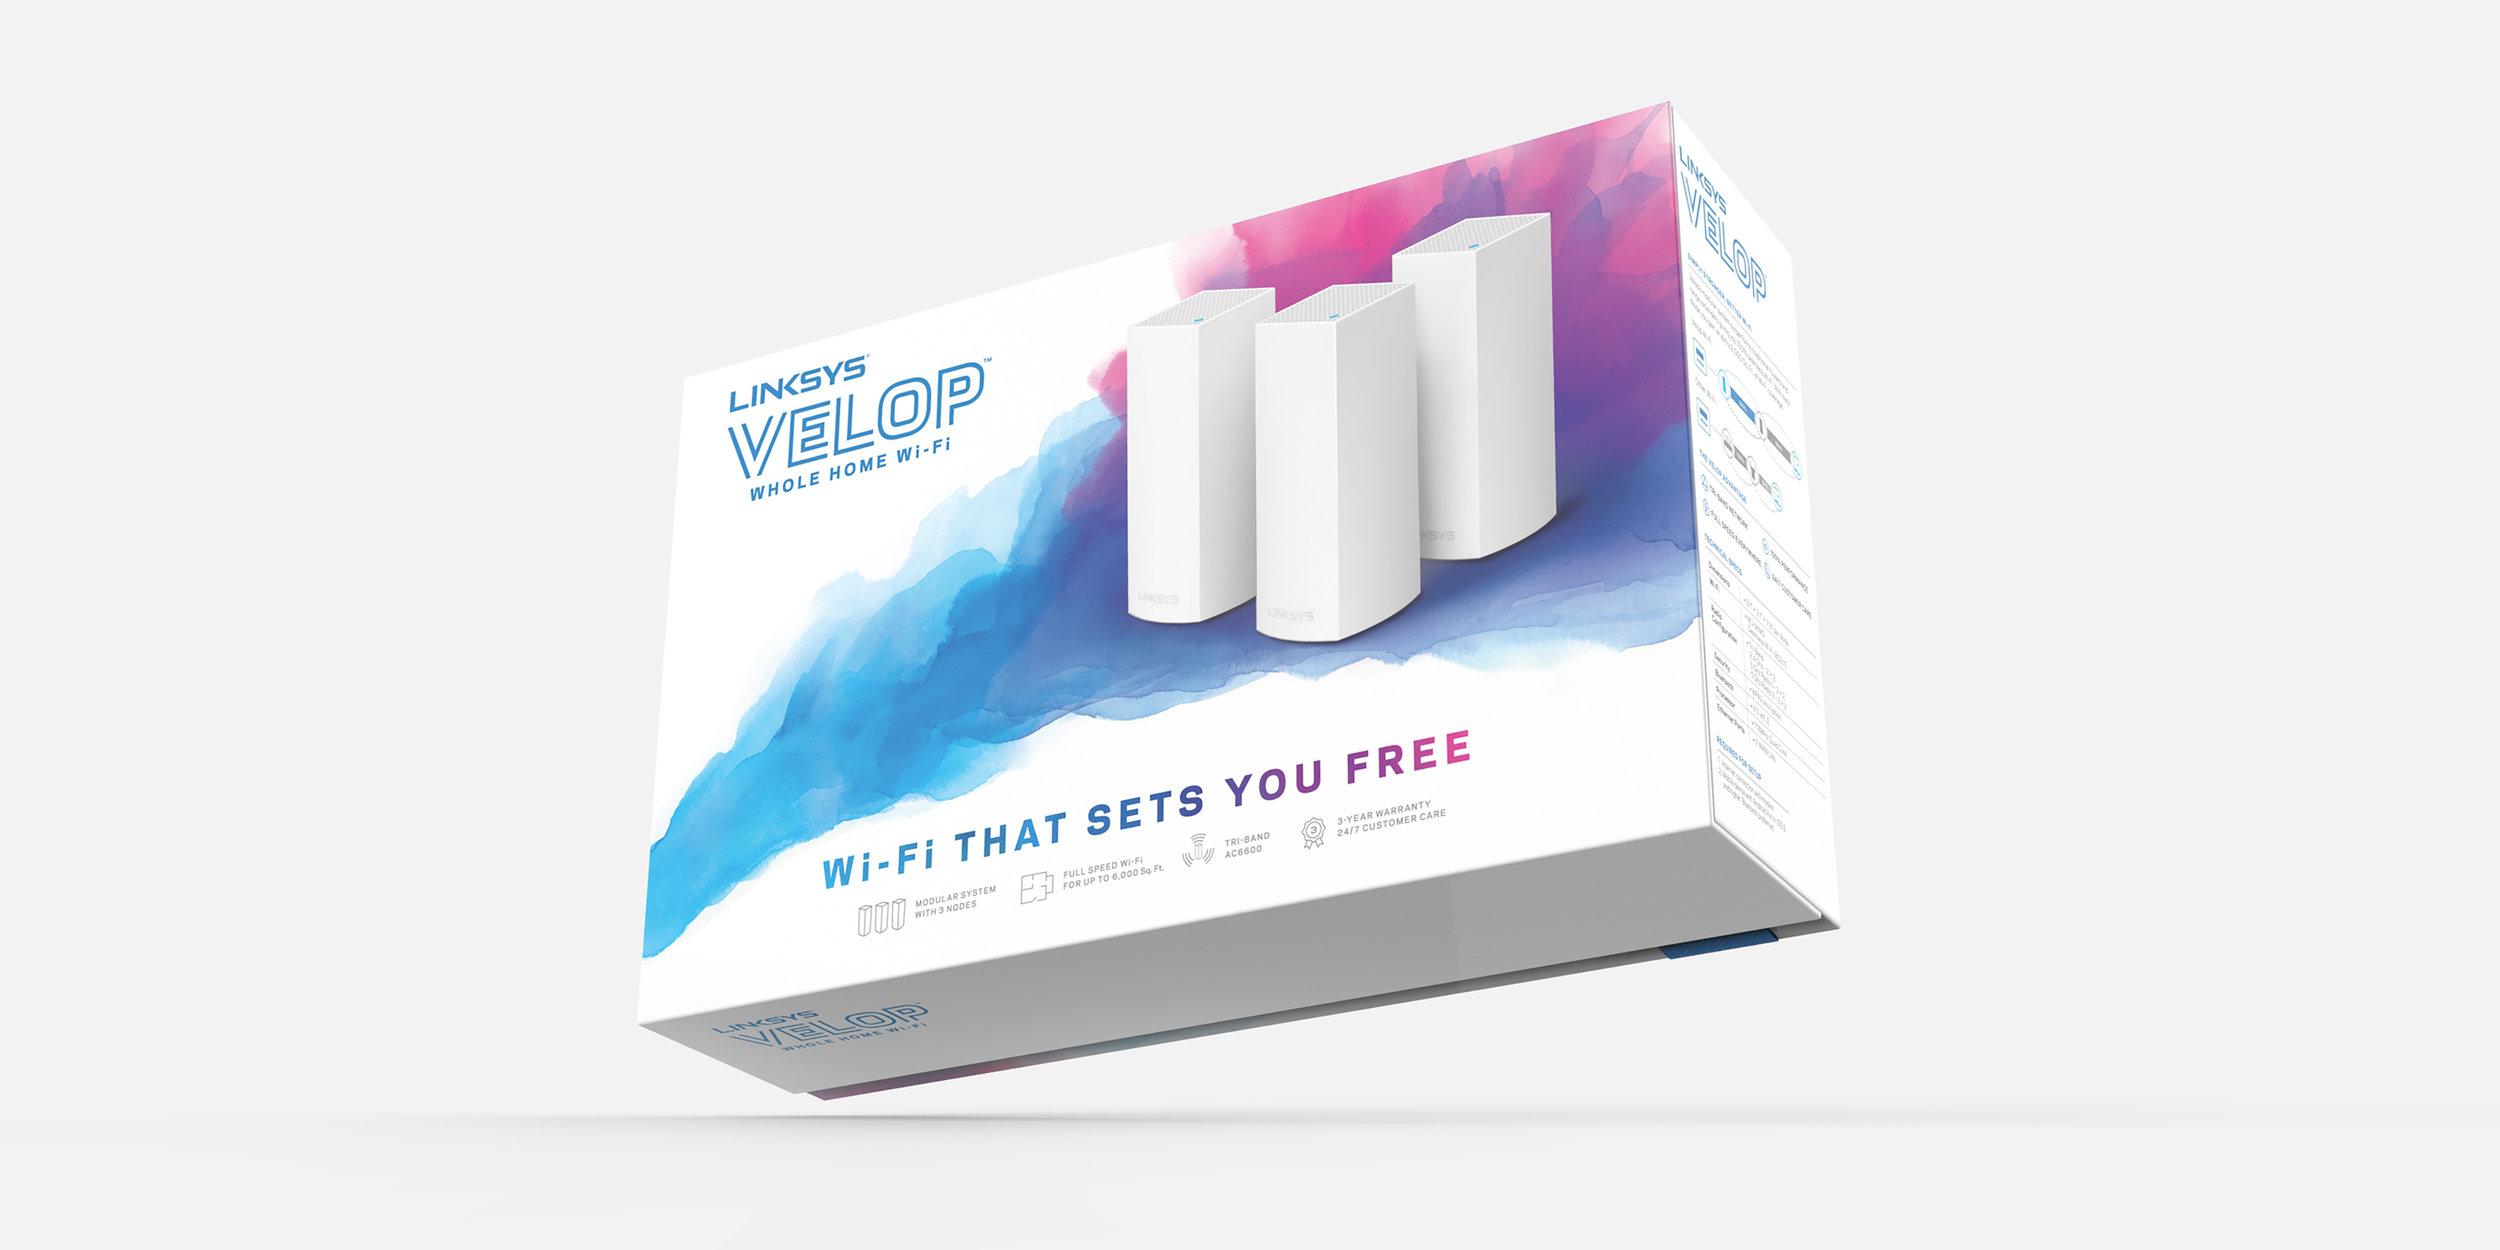 Linksys Velop Branding   Packaging Design